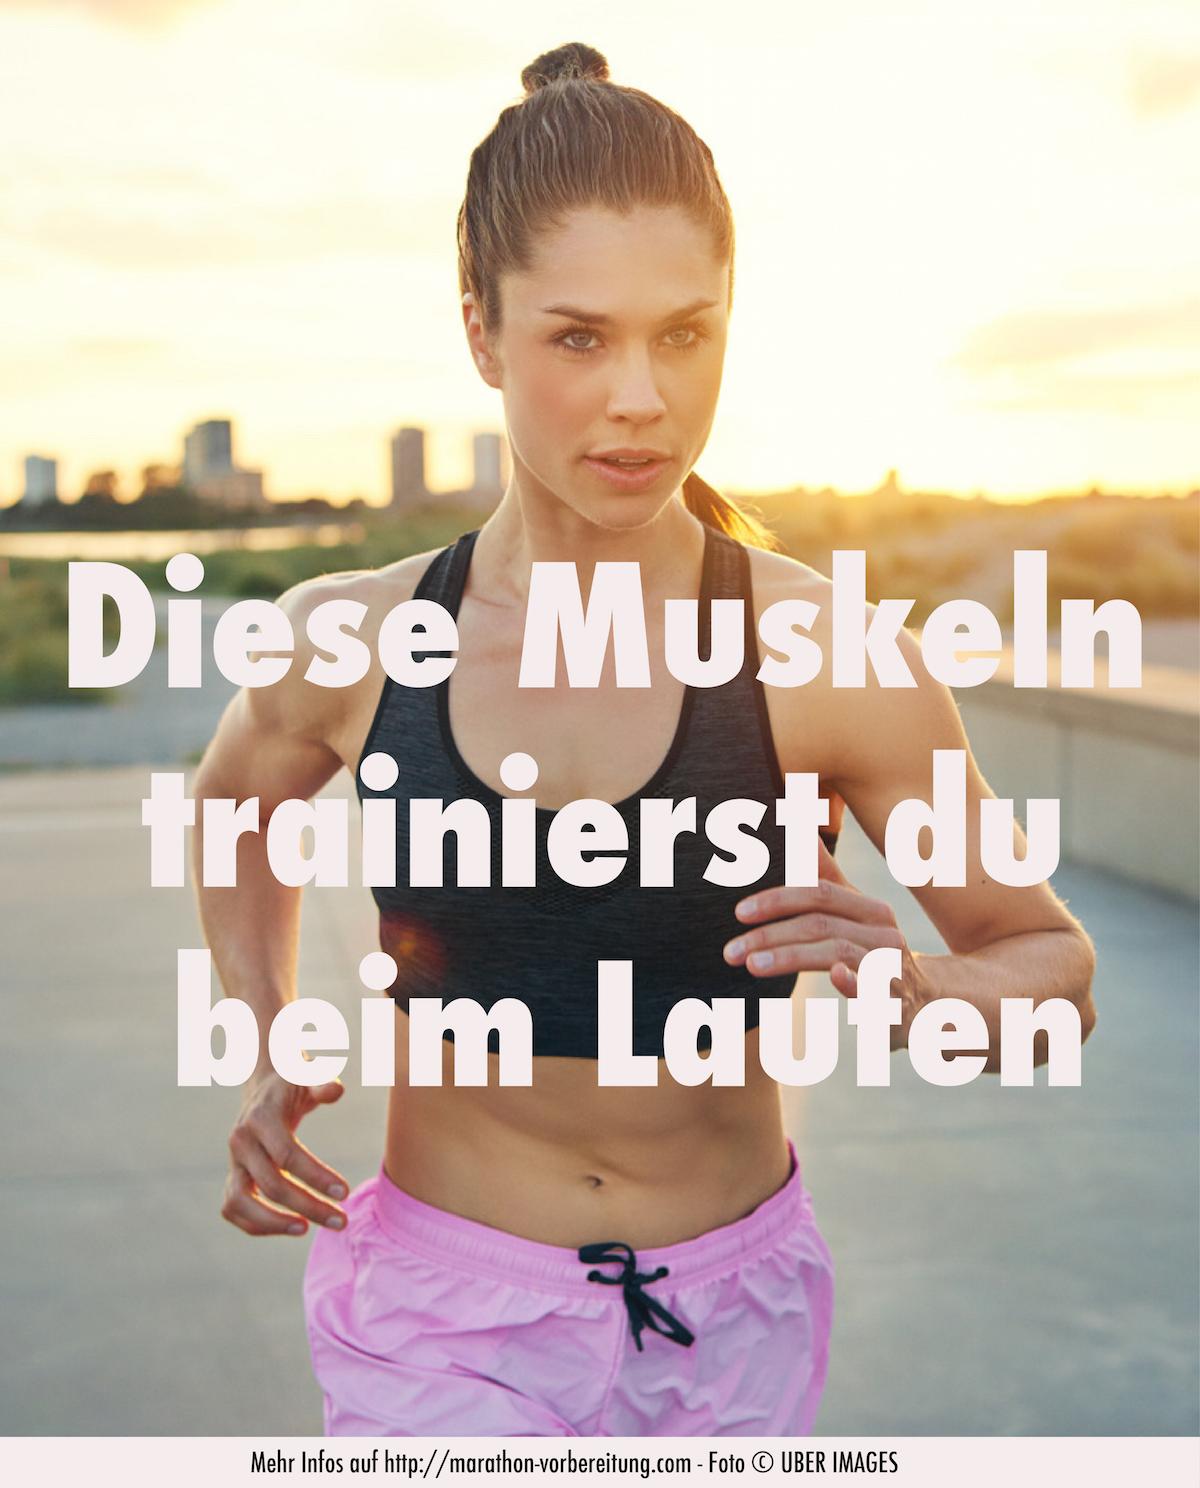 Marathon-Vorbereitung - cover